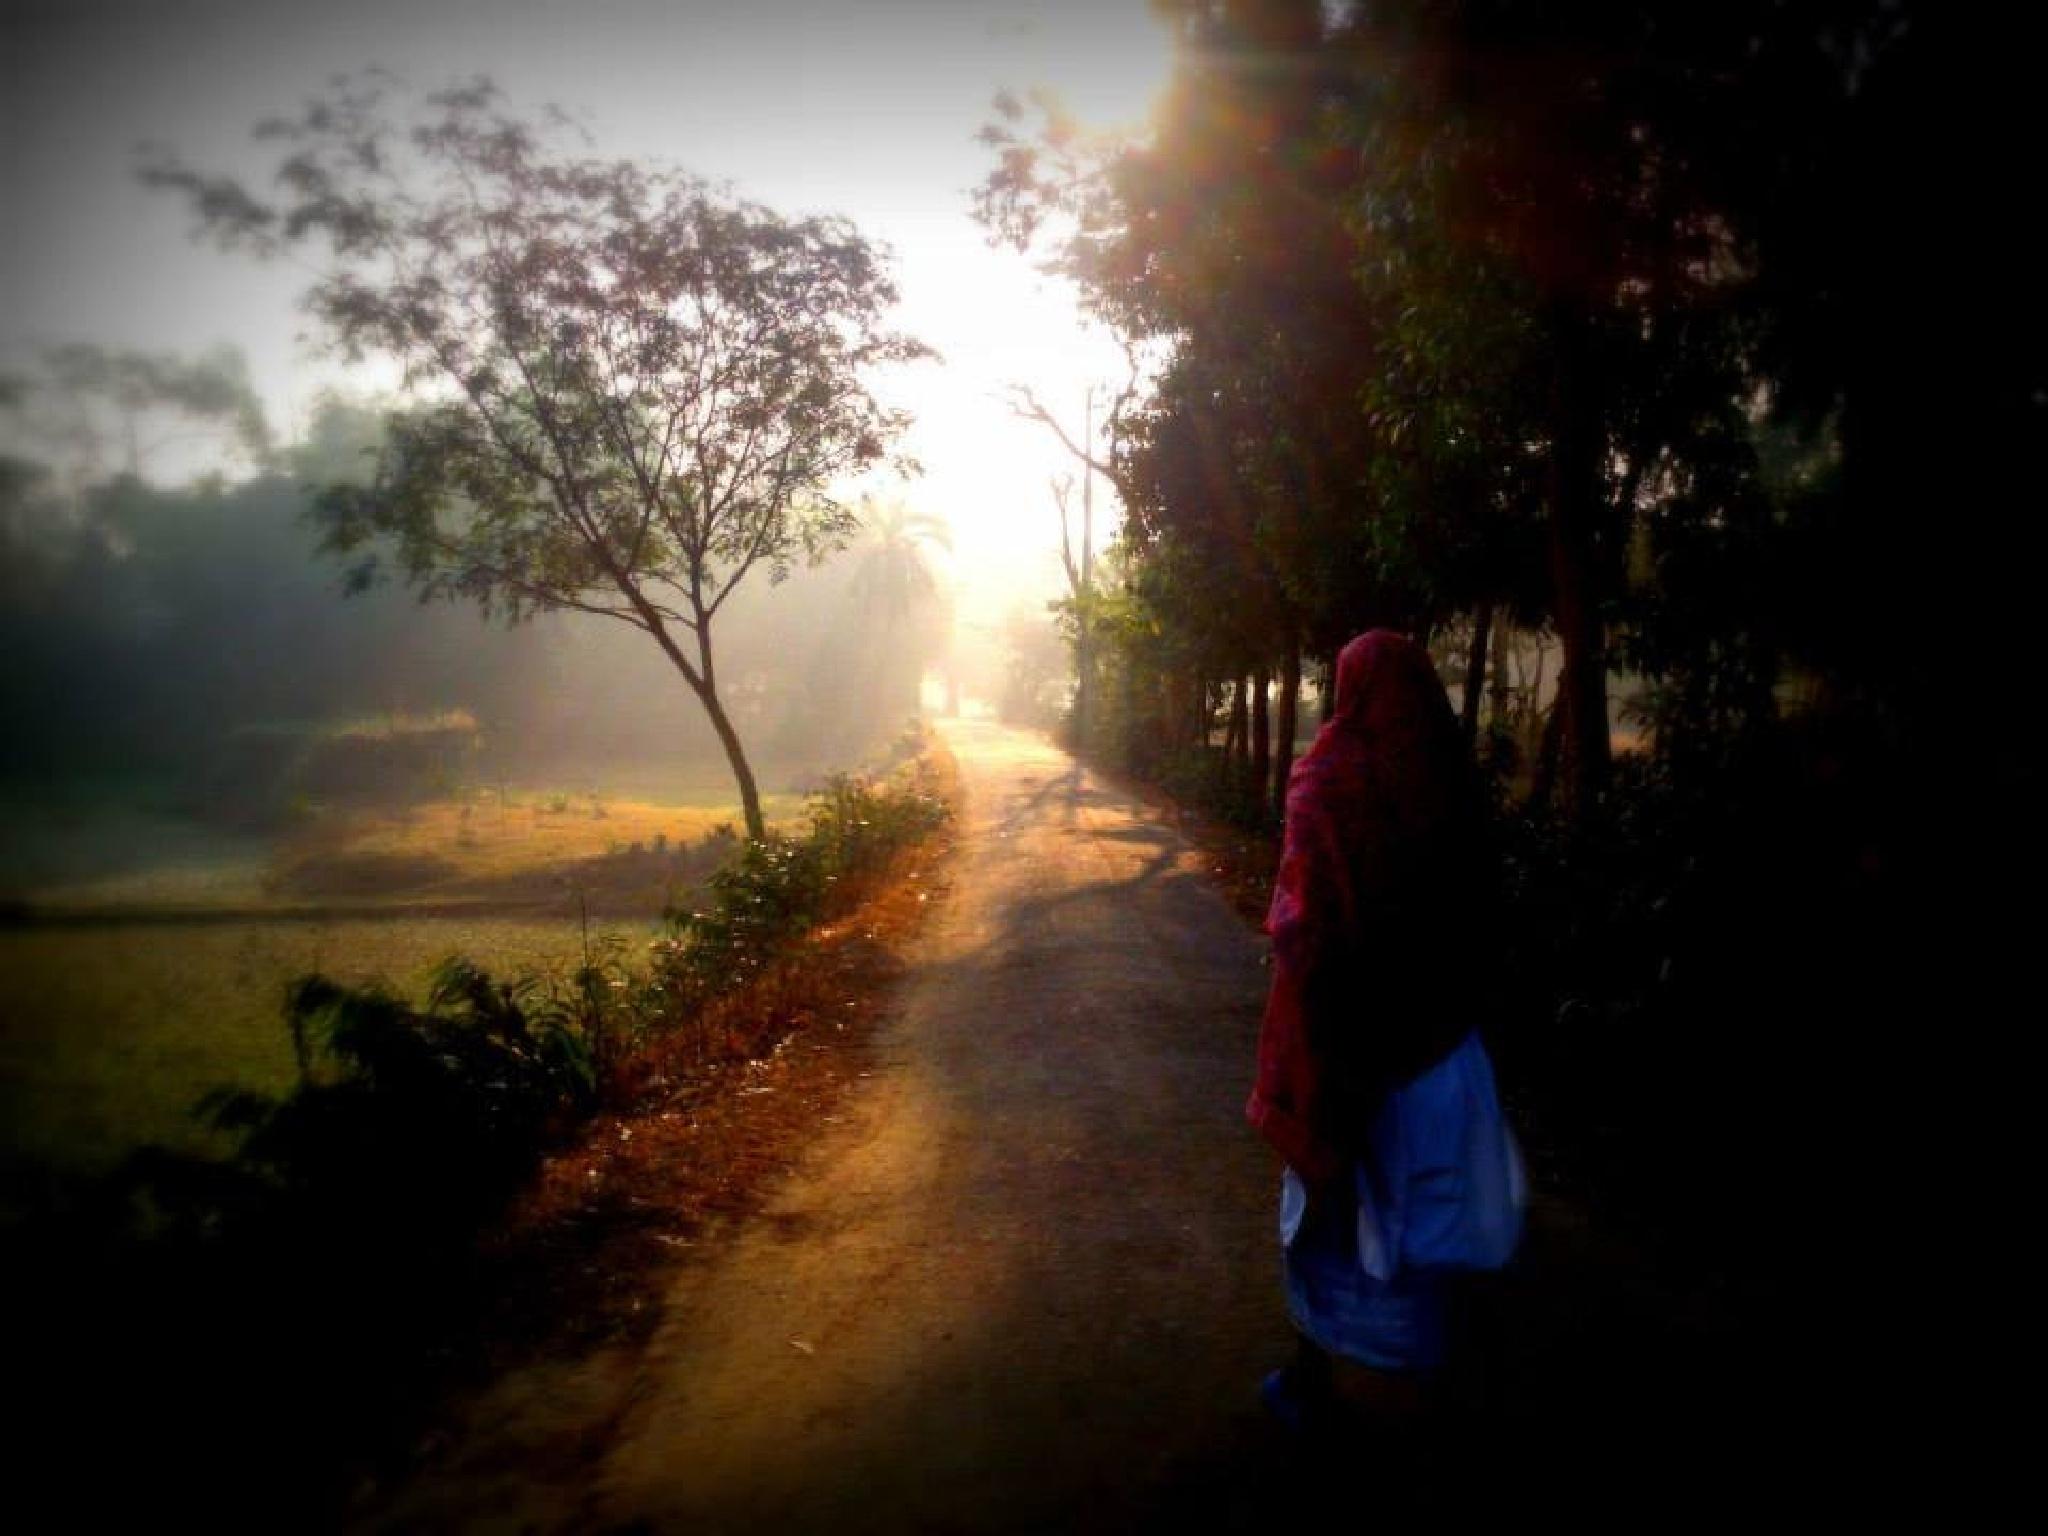 A foggy morning by Abdullah Ibn Ali